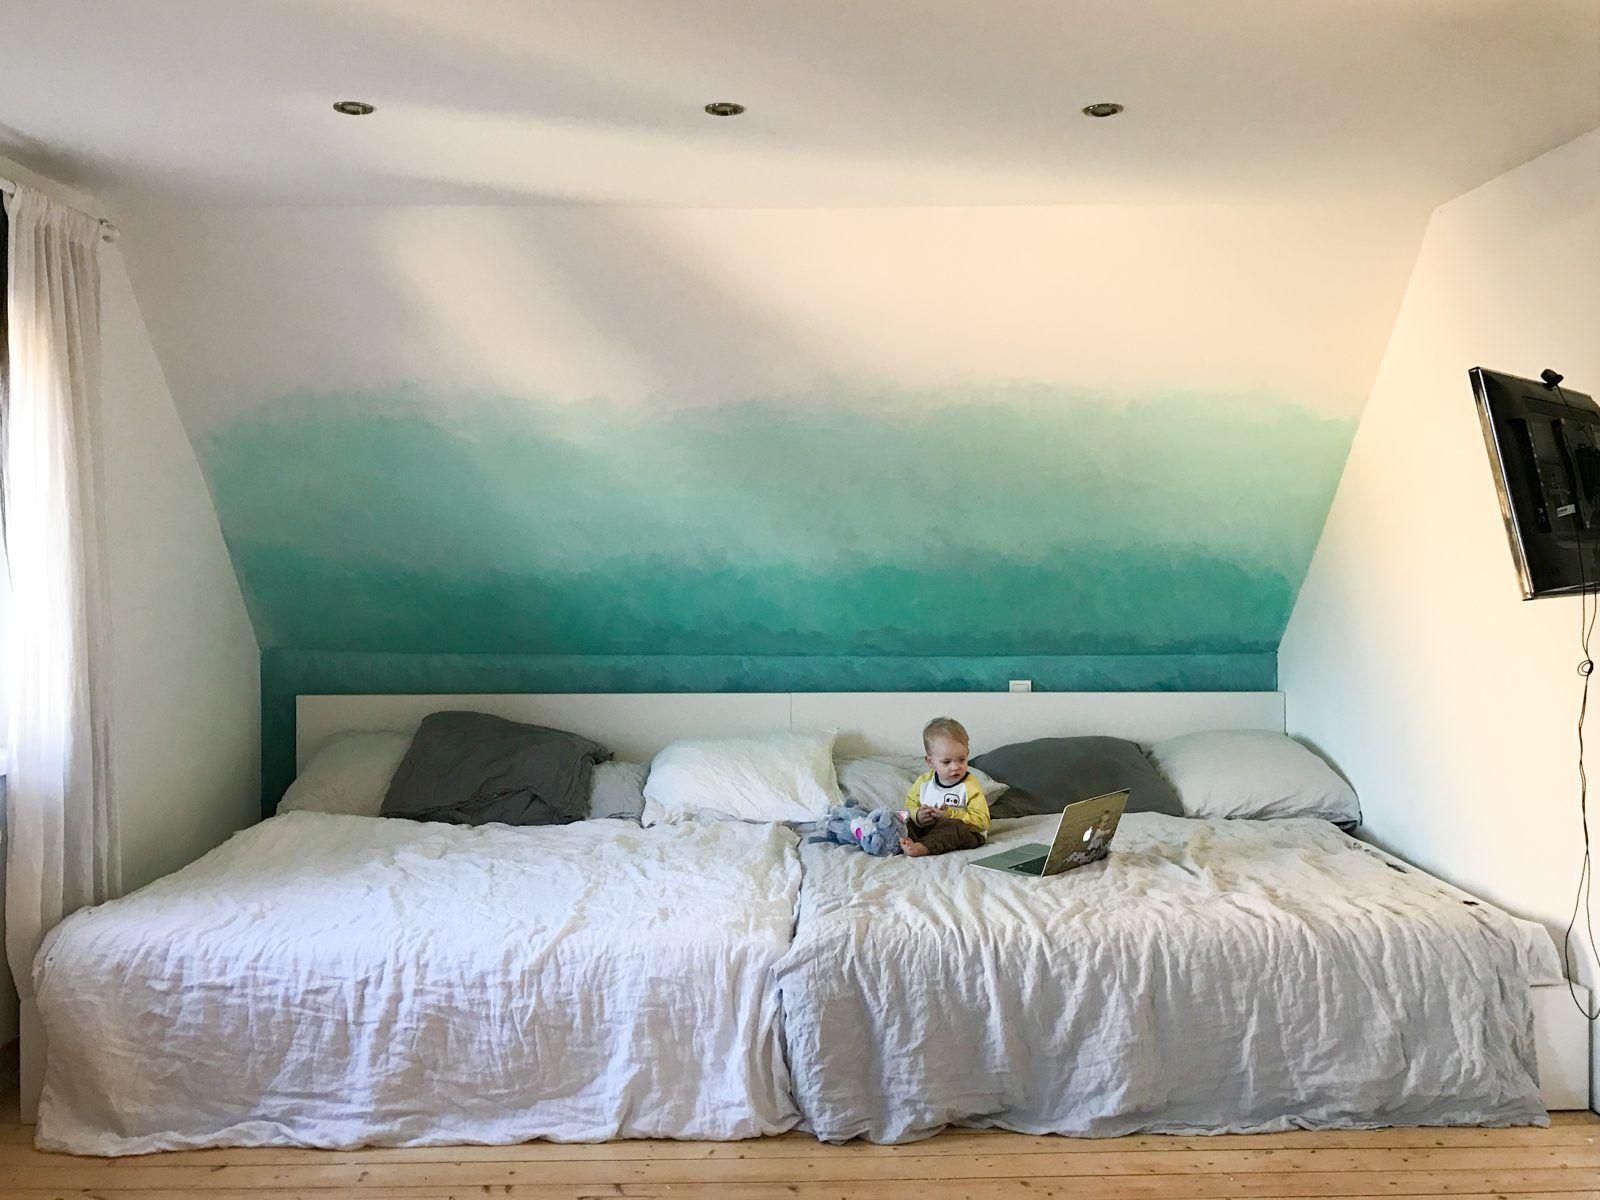 Projekt großes Familienbett XXL | Familienbett, Doppelbett und Matratze